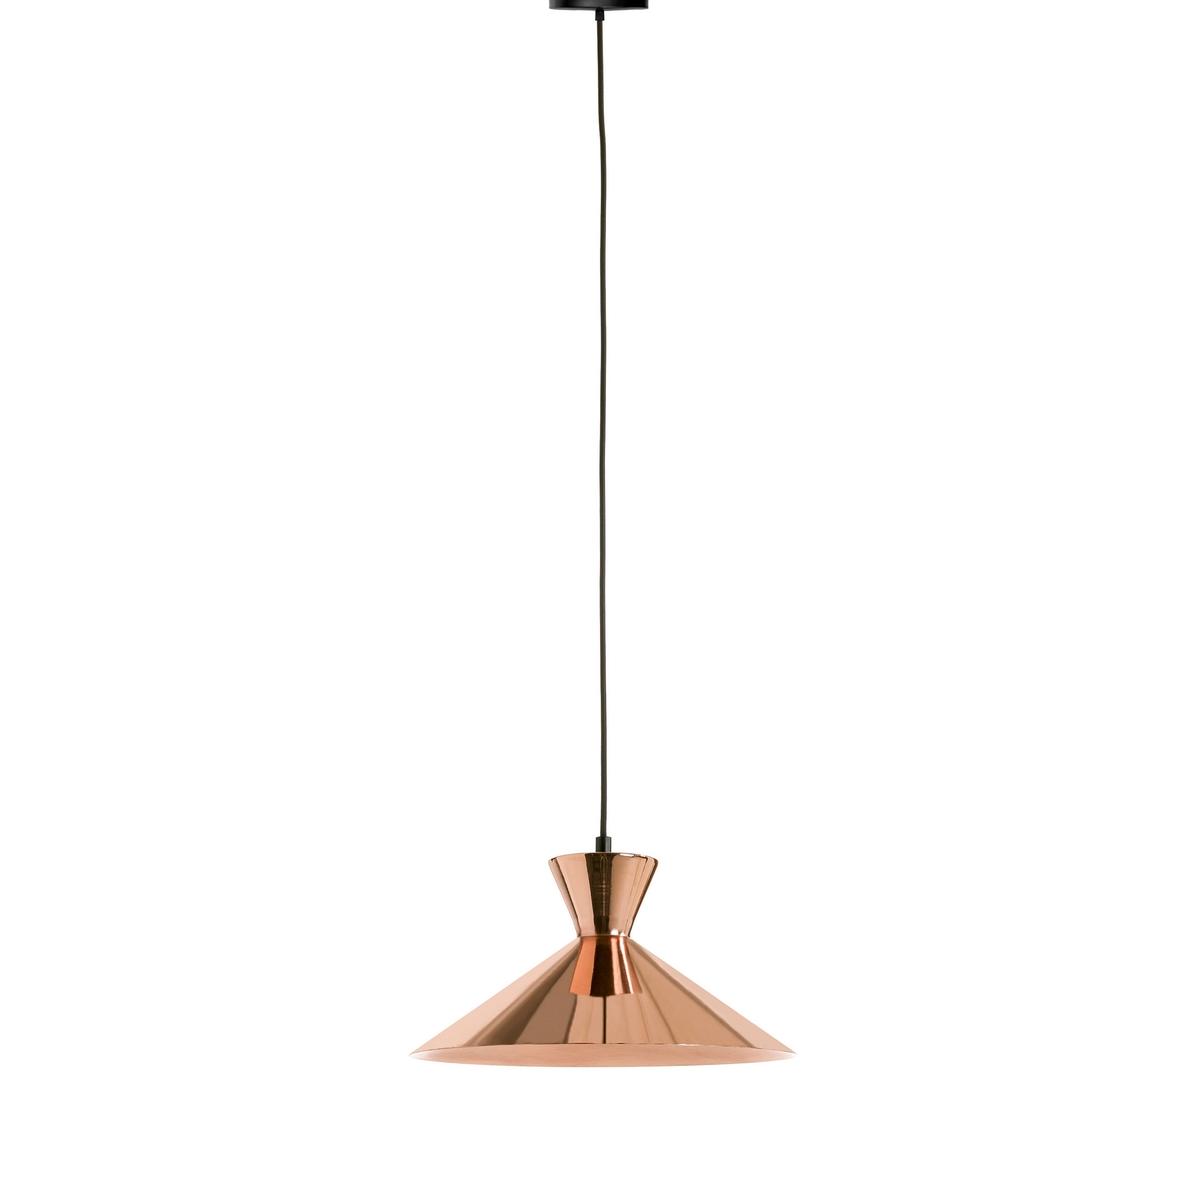 Светильник Voltige от La Redoute